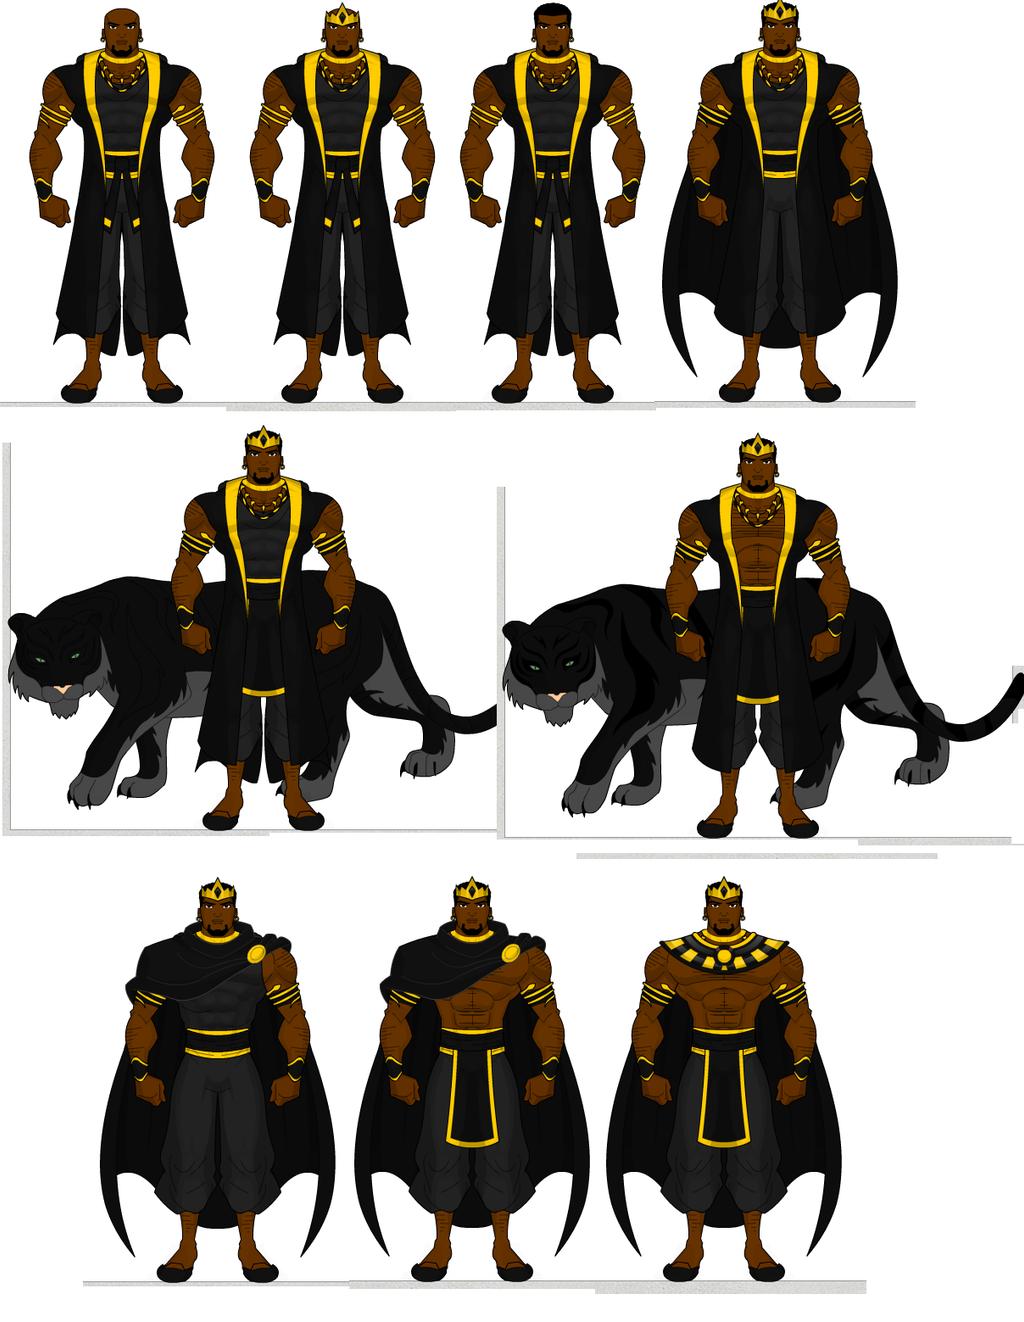 Black Panther Concept By SplendorEnt On DeviantArt